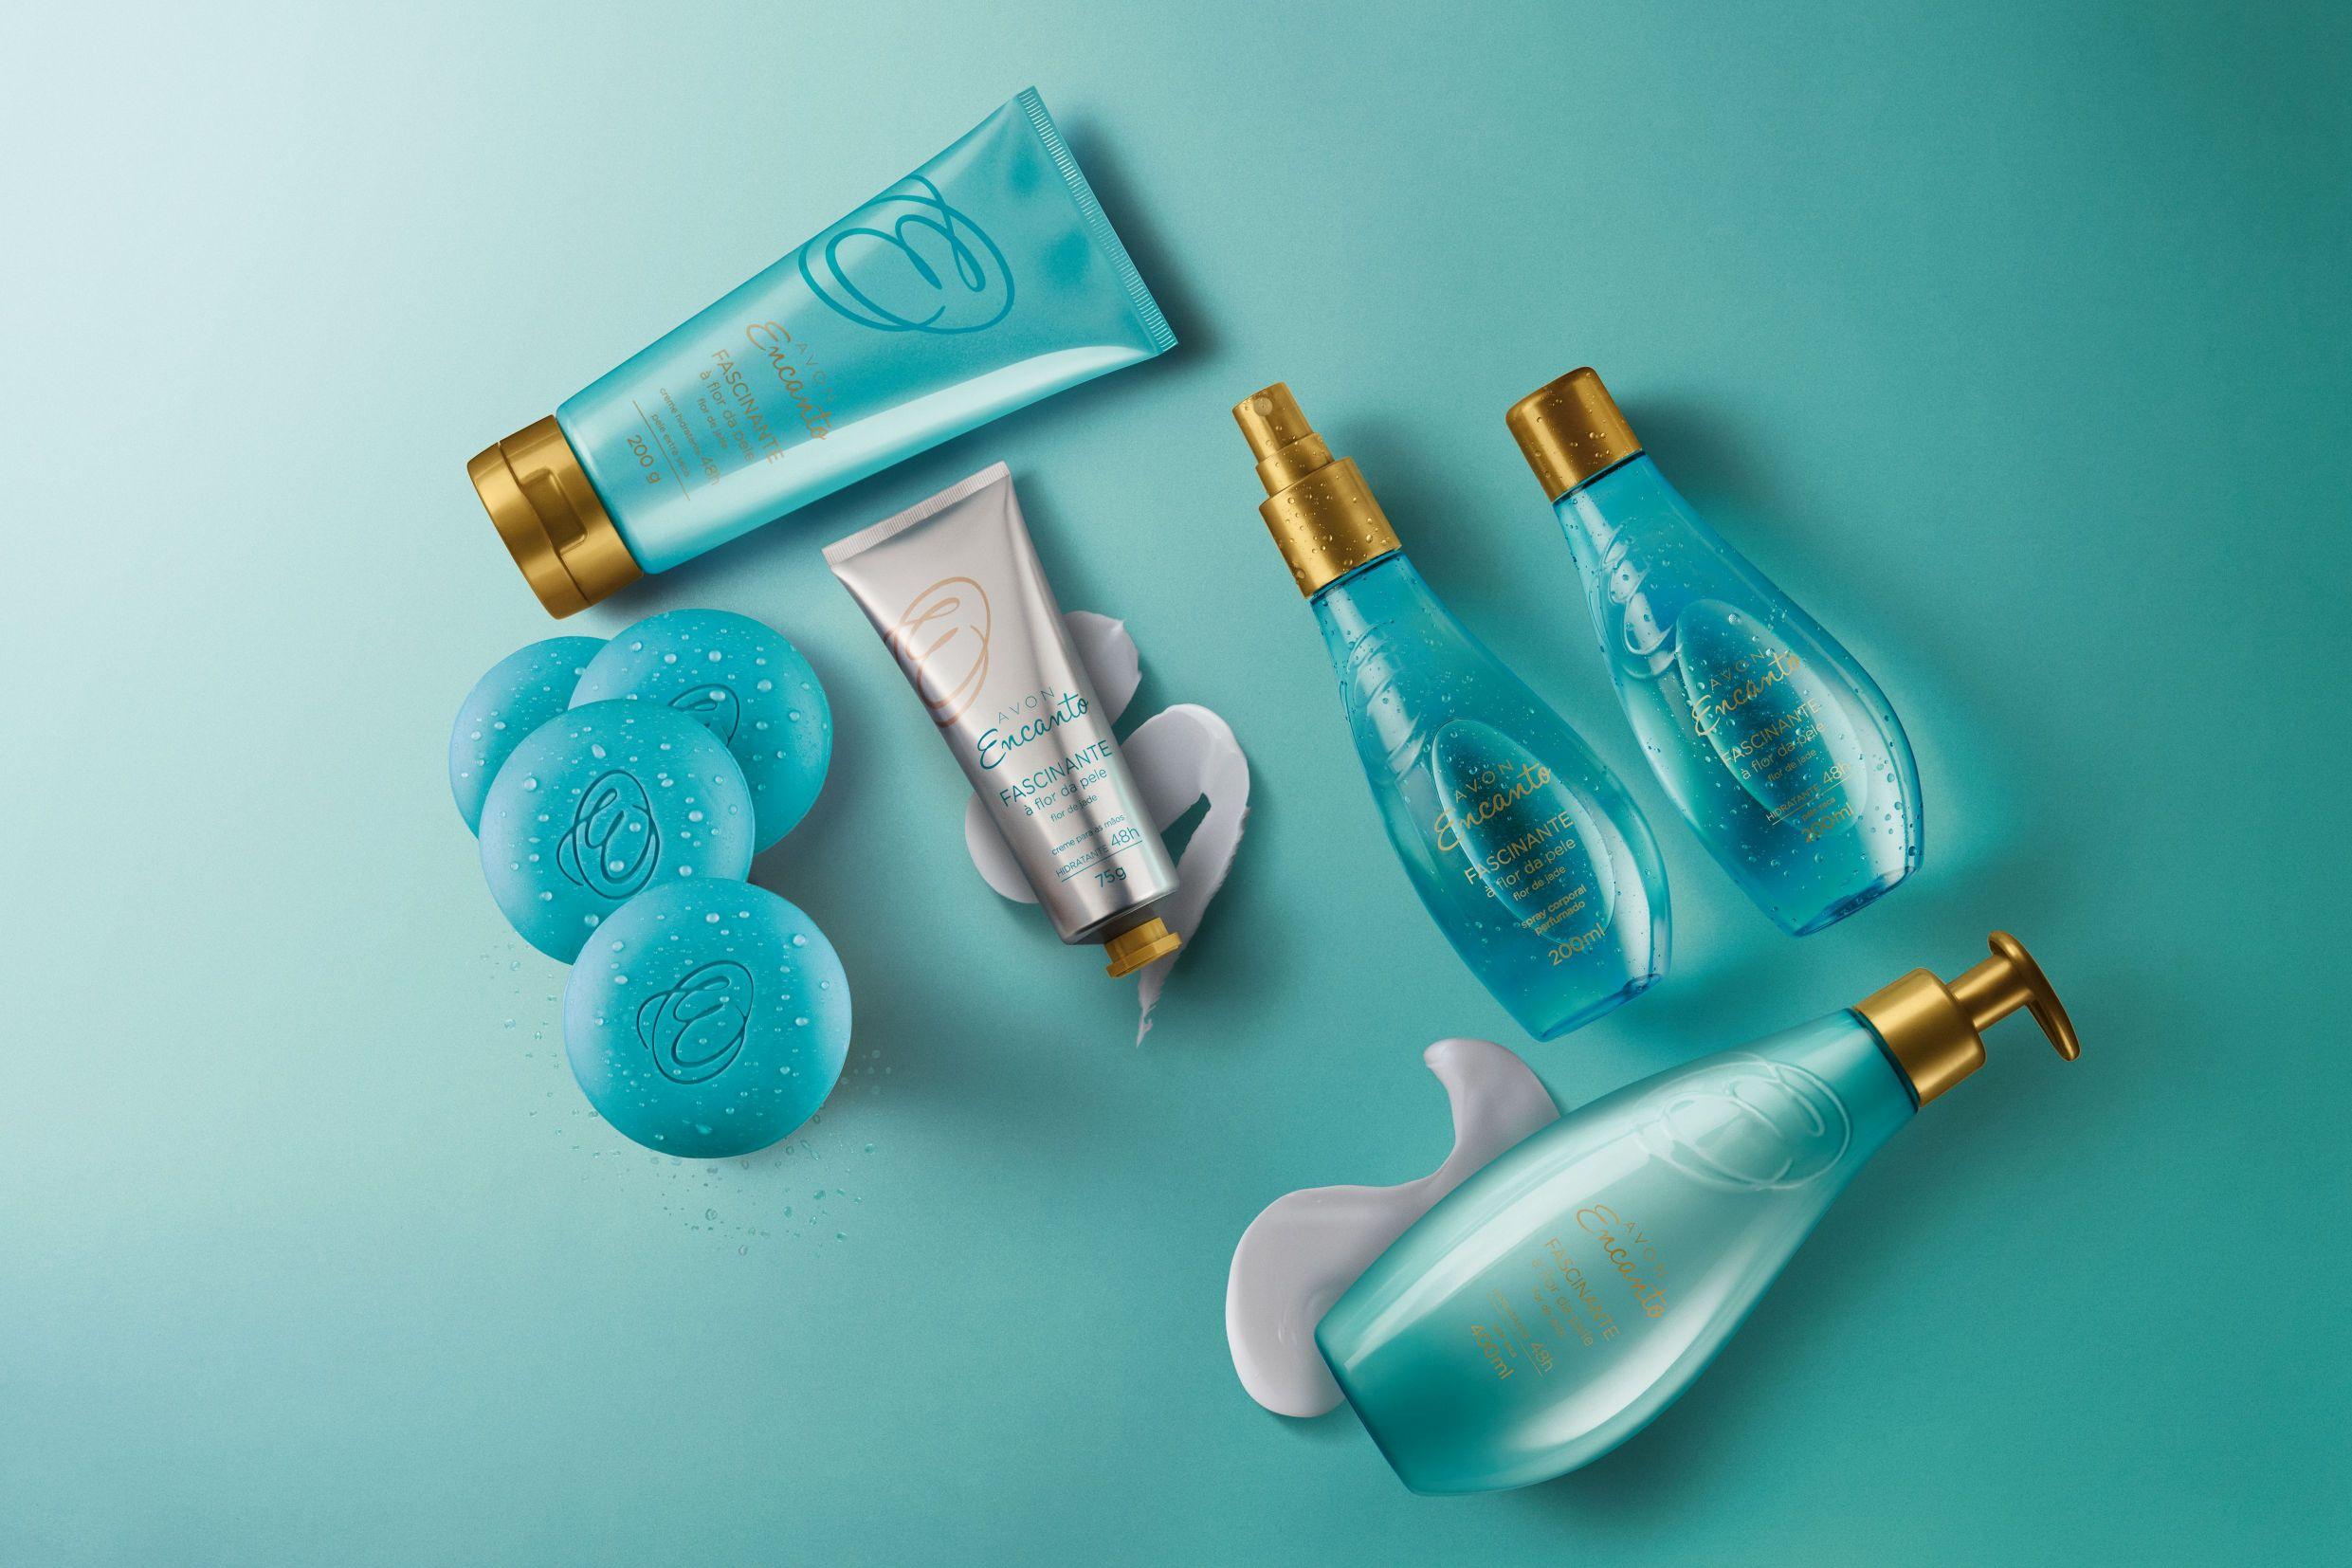 Avon presents Encanto's luxurious ritual of skin care